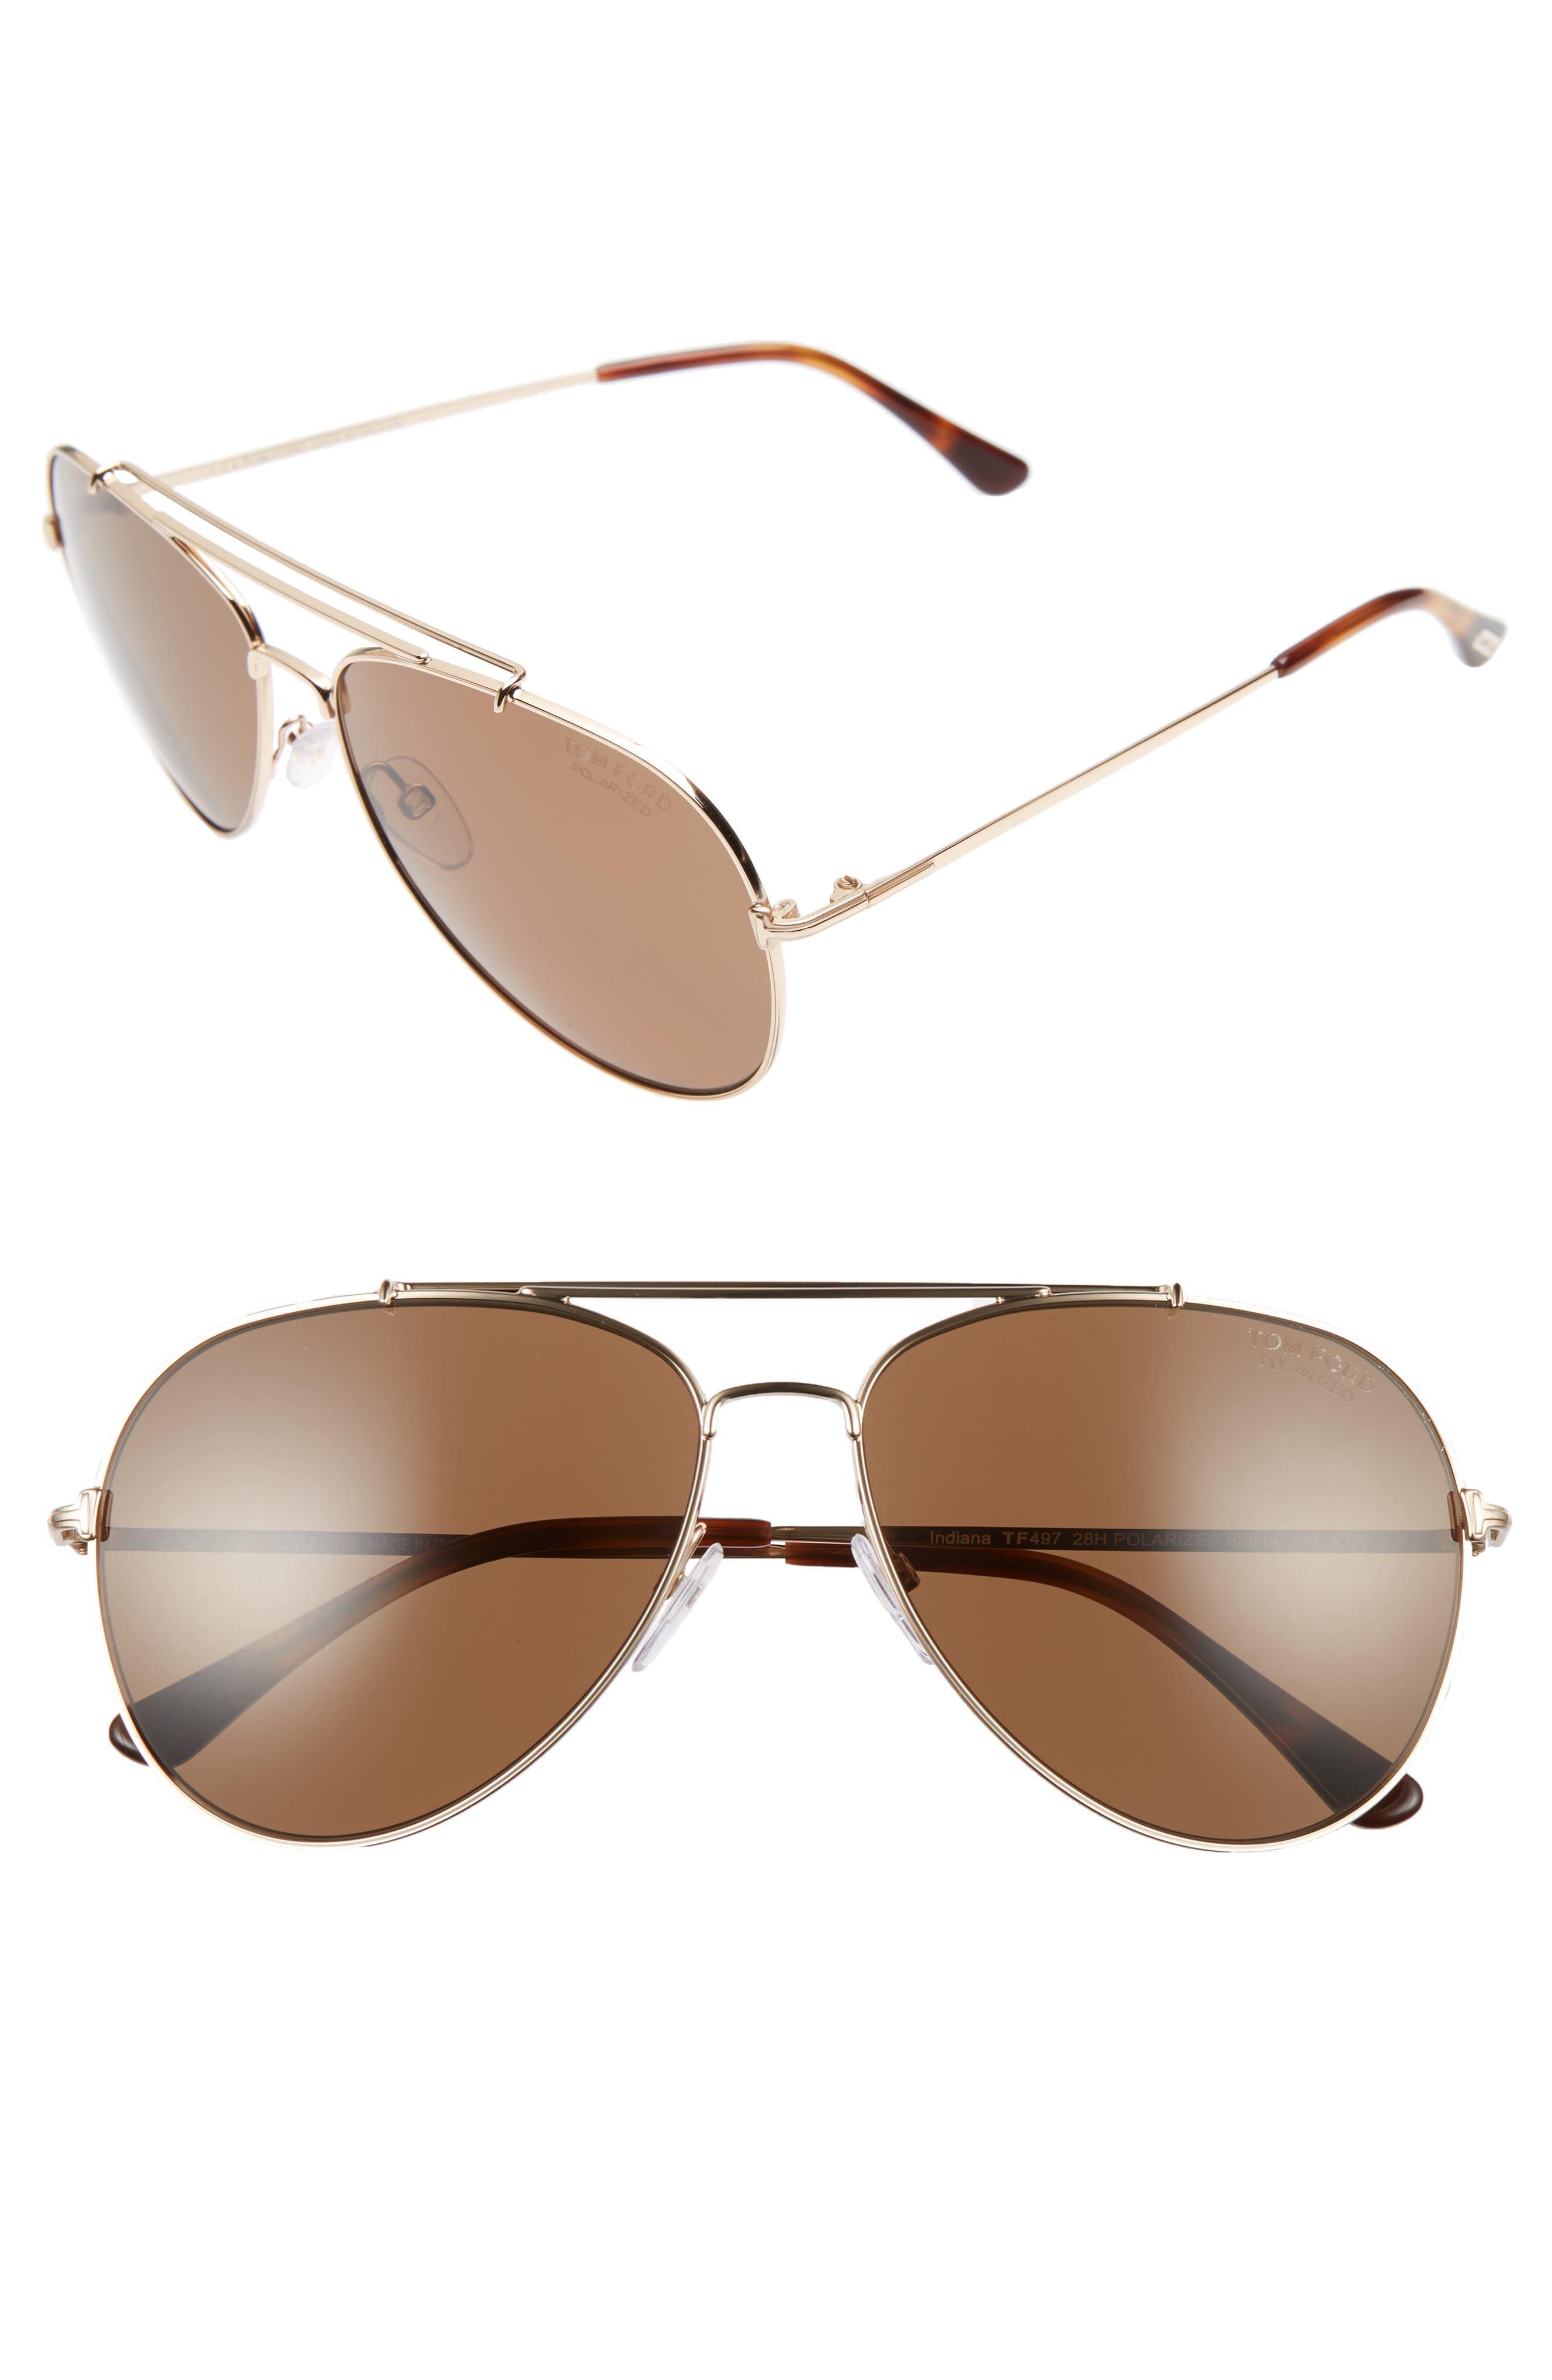 Tom Ford Indiana 58mm Polarized Aviator Sunglasses